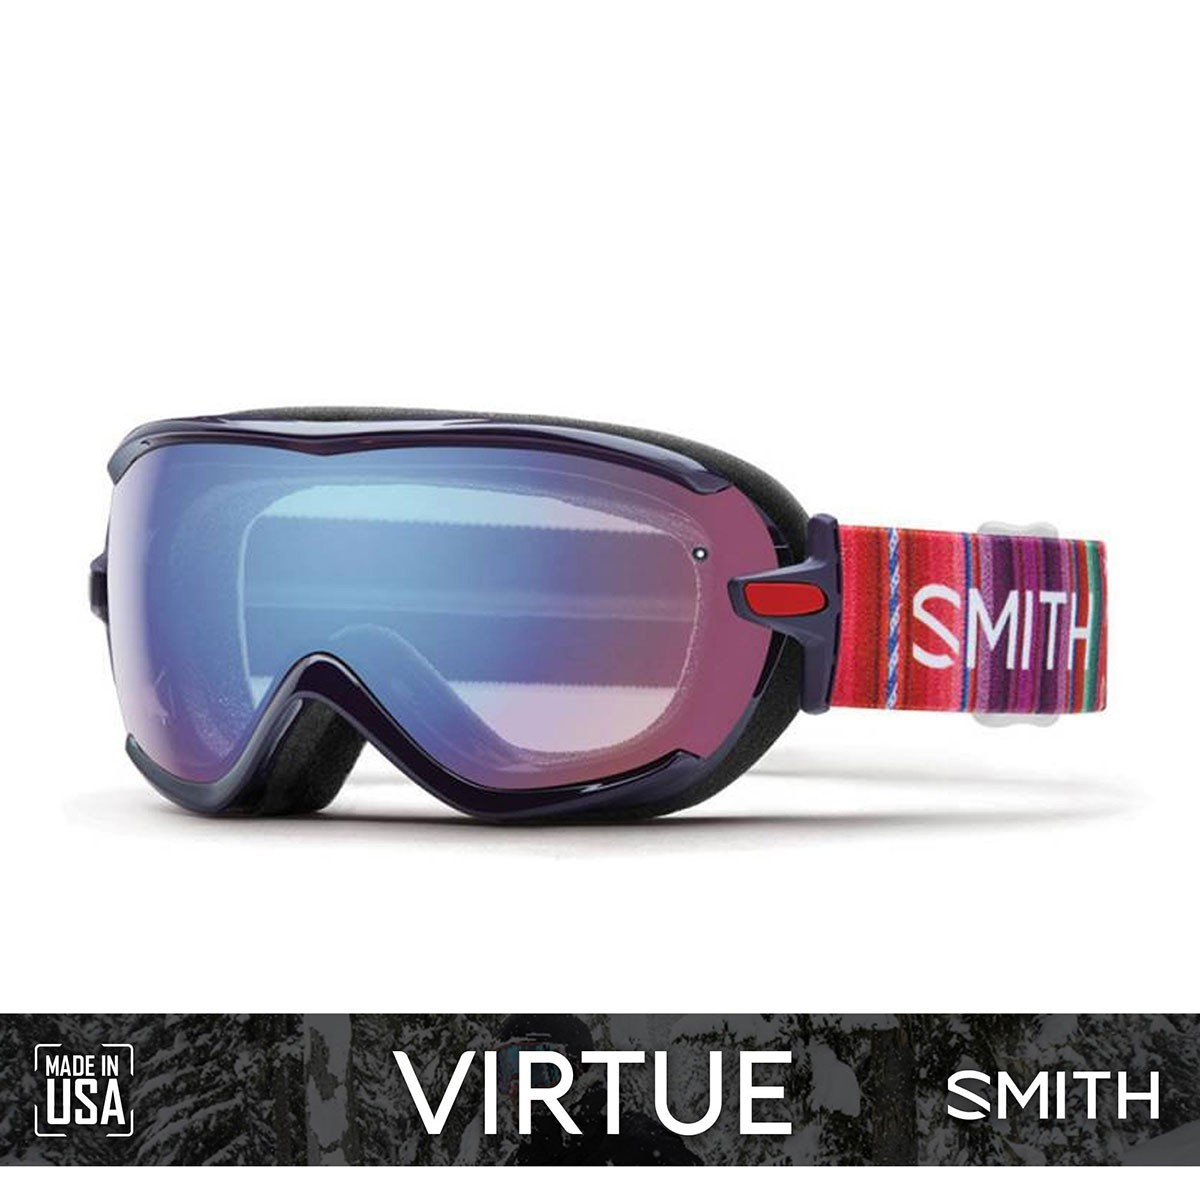 SMITH VIRTUE Cuzco | S2 BLUE Sensor Mirror - Изображение - AQUAMATRIX